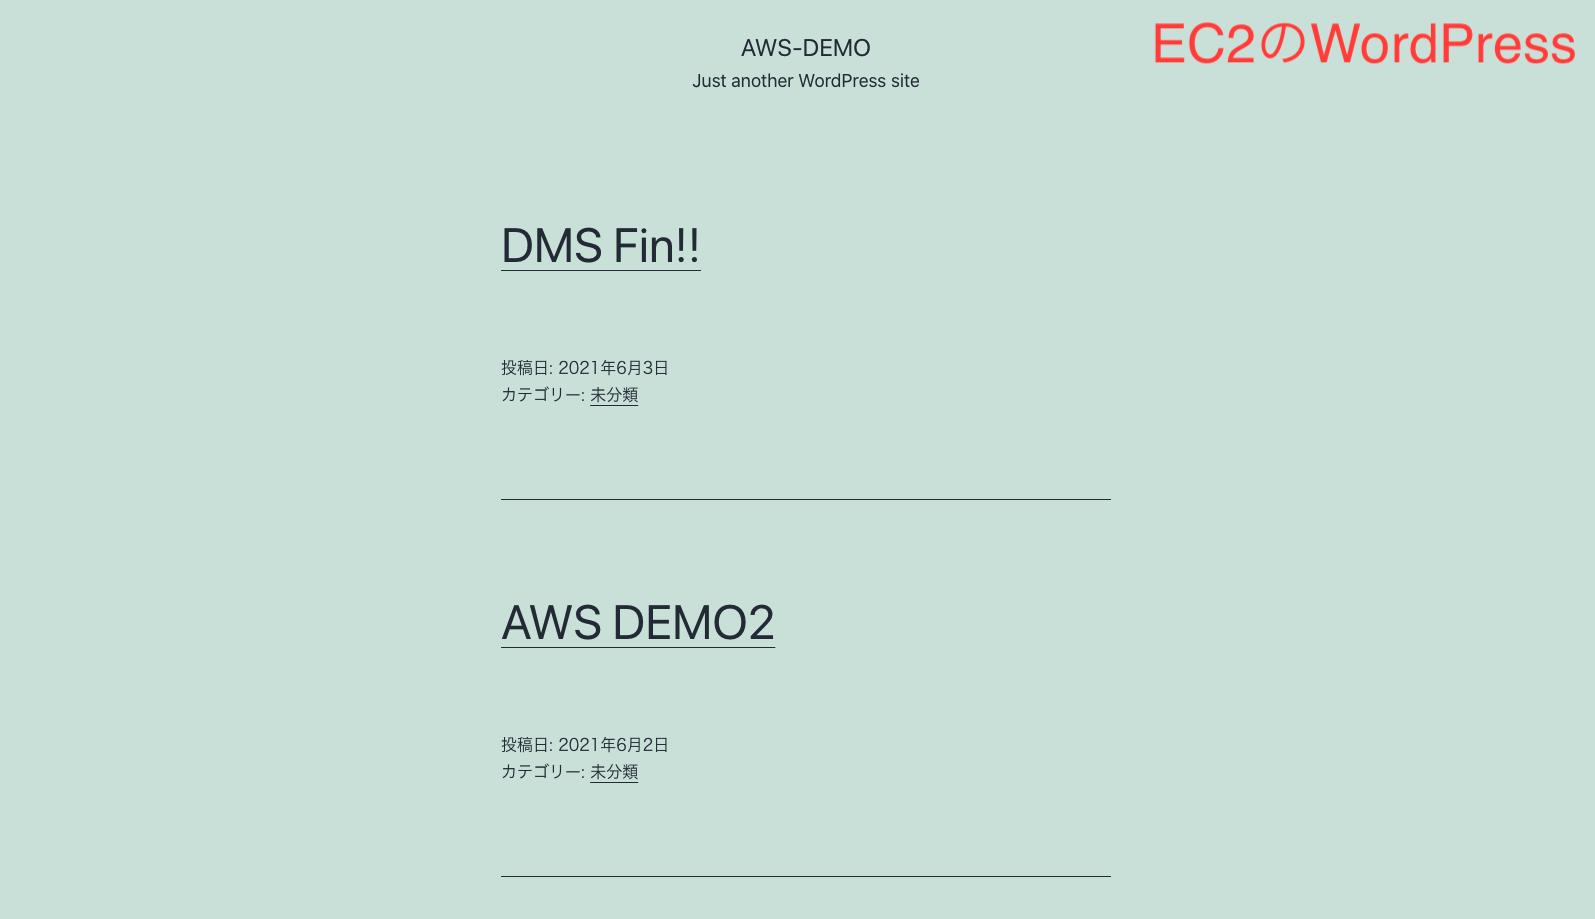 https://cdn-ssl-devio-img.classmethod.jp/wp-content/uploads/2021/06/2021-06-03_13.23.06.png